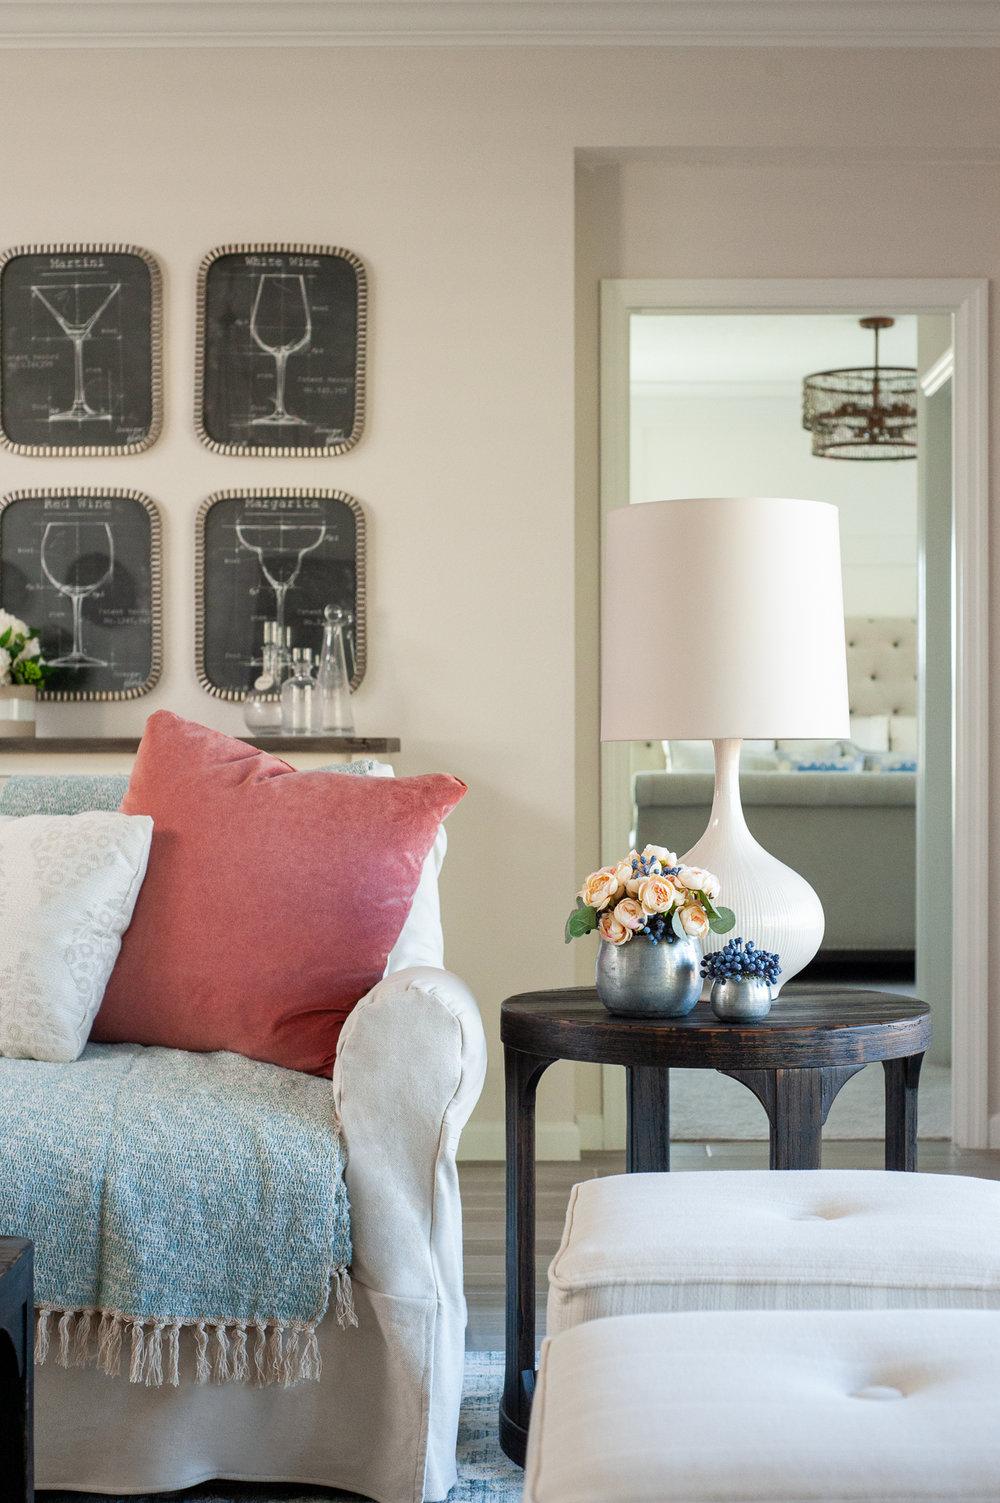 Micamy_Interior Designer_Design_Interior_Model_Merchandising_Living_Room_Rowe_Furniture_Traditional_Transitional_Arteriors_McGee & Co_Ottoman.jpg